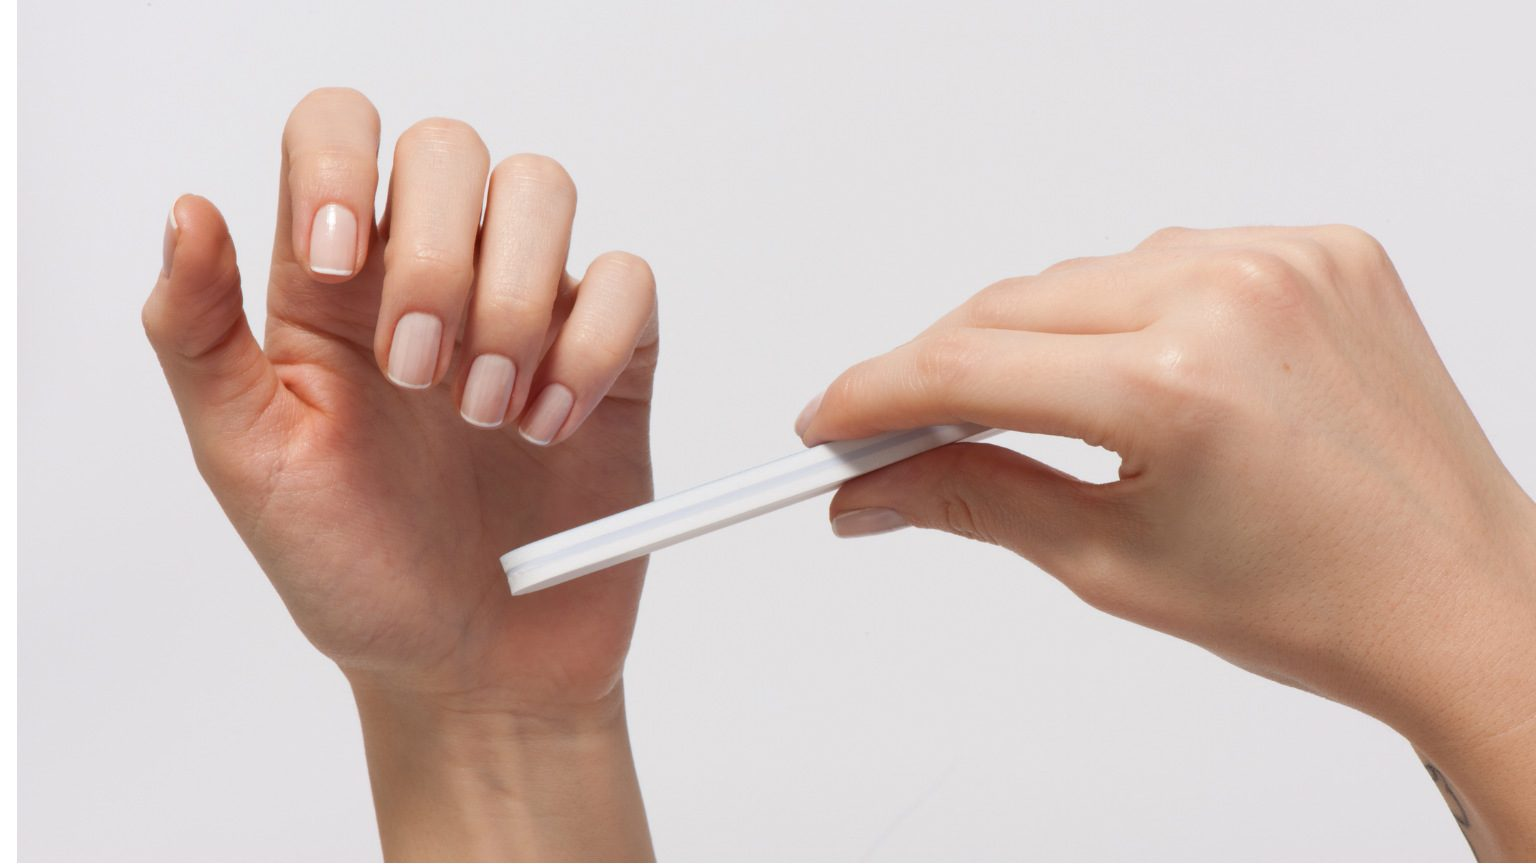 Model filing her nails